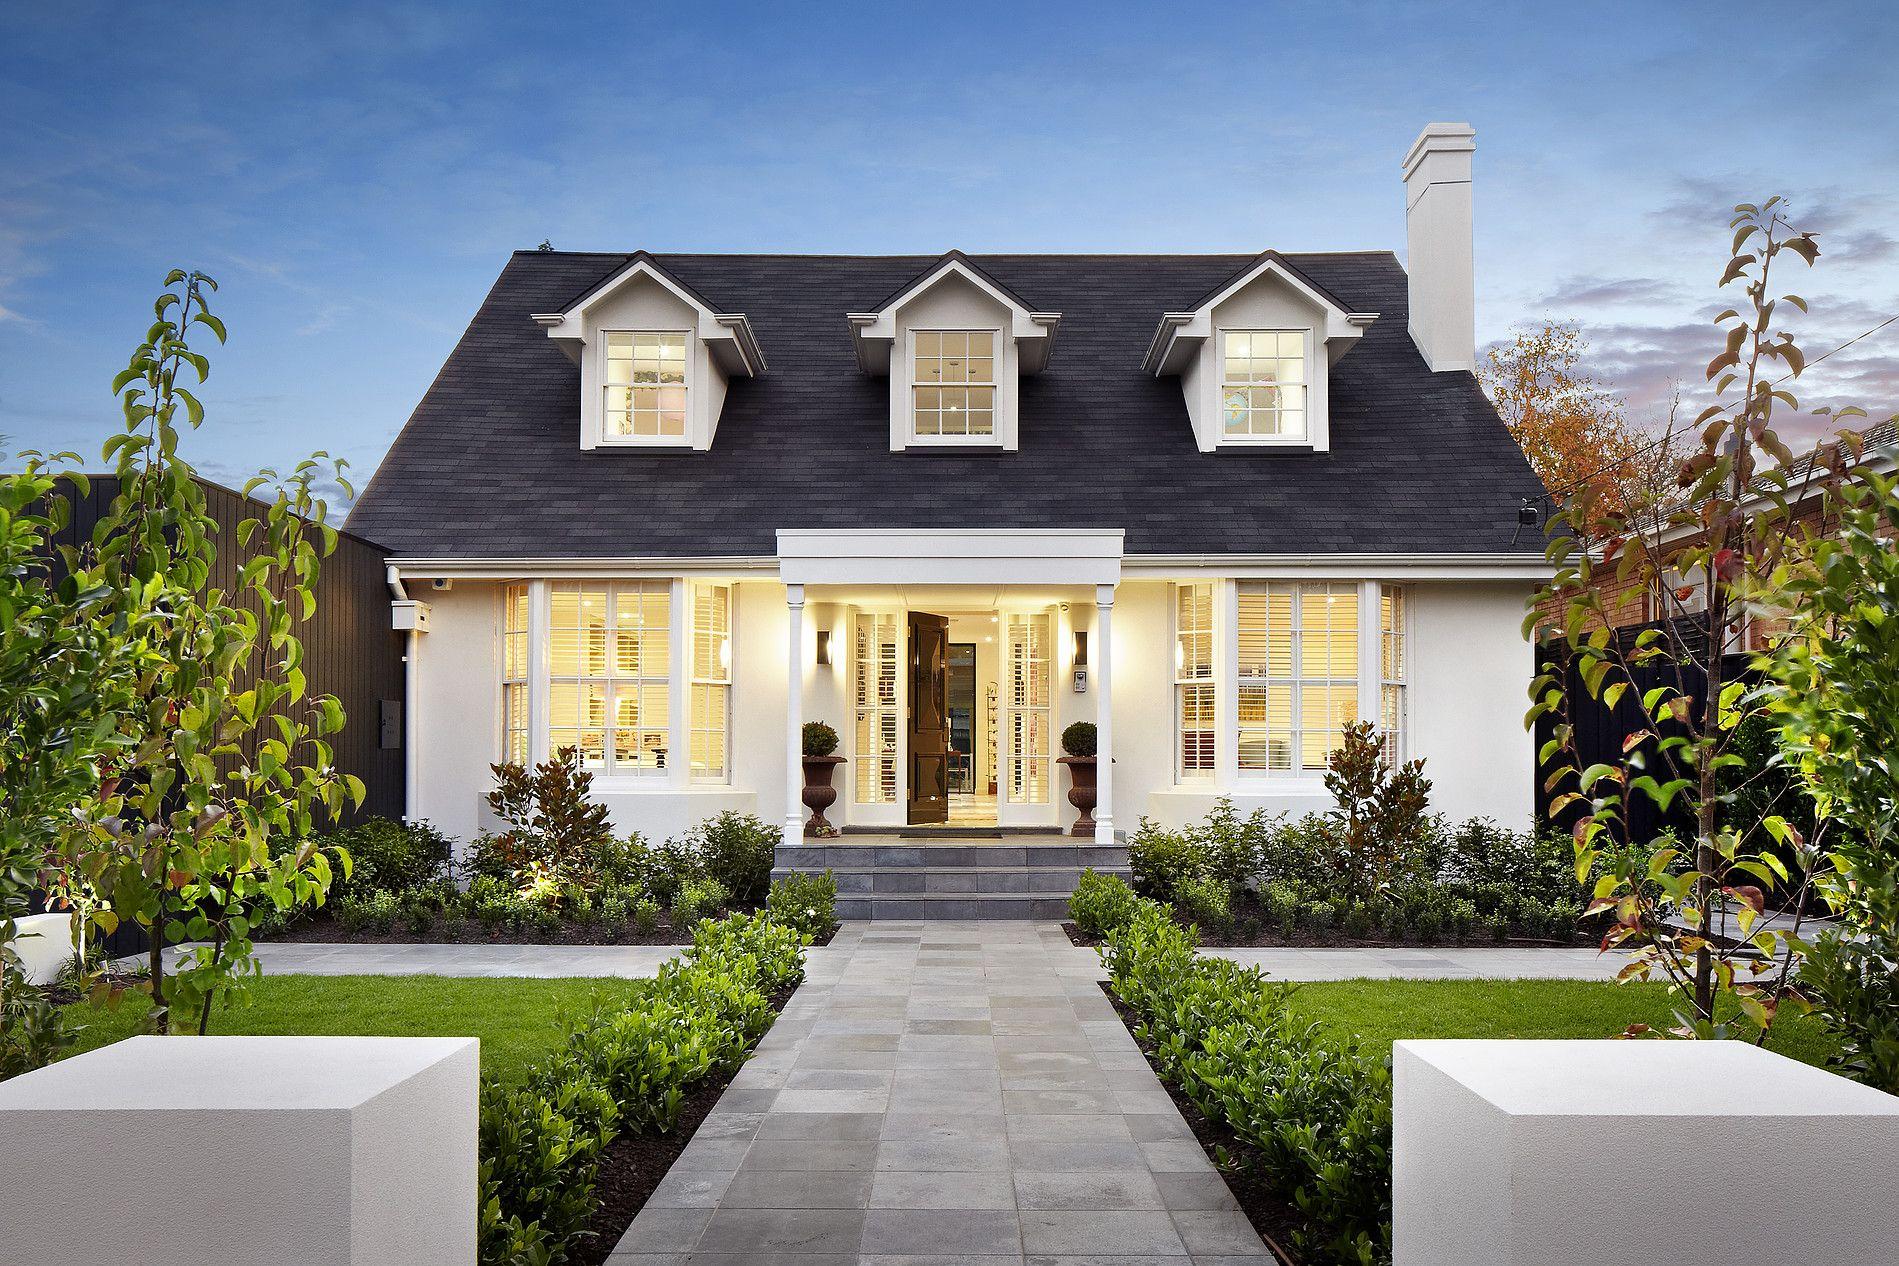 Amber Hope Design Architectural Interior Design Melbourne Cape Cod Style House Cape Cod House Exterior Cape Style Homes